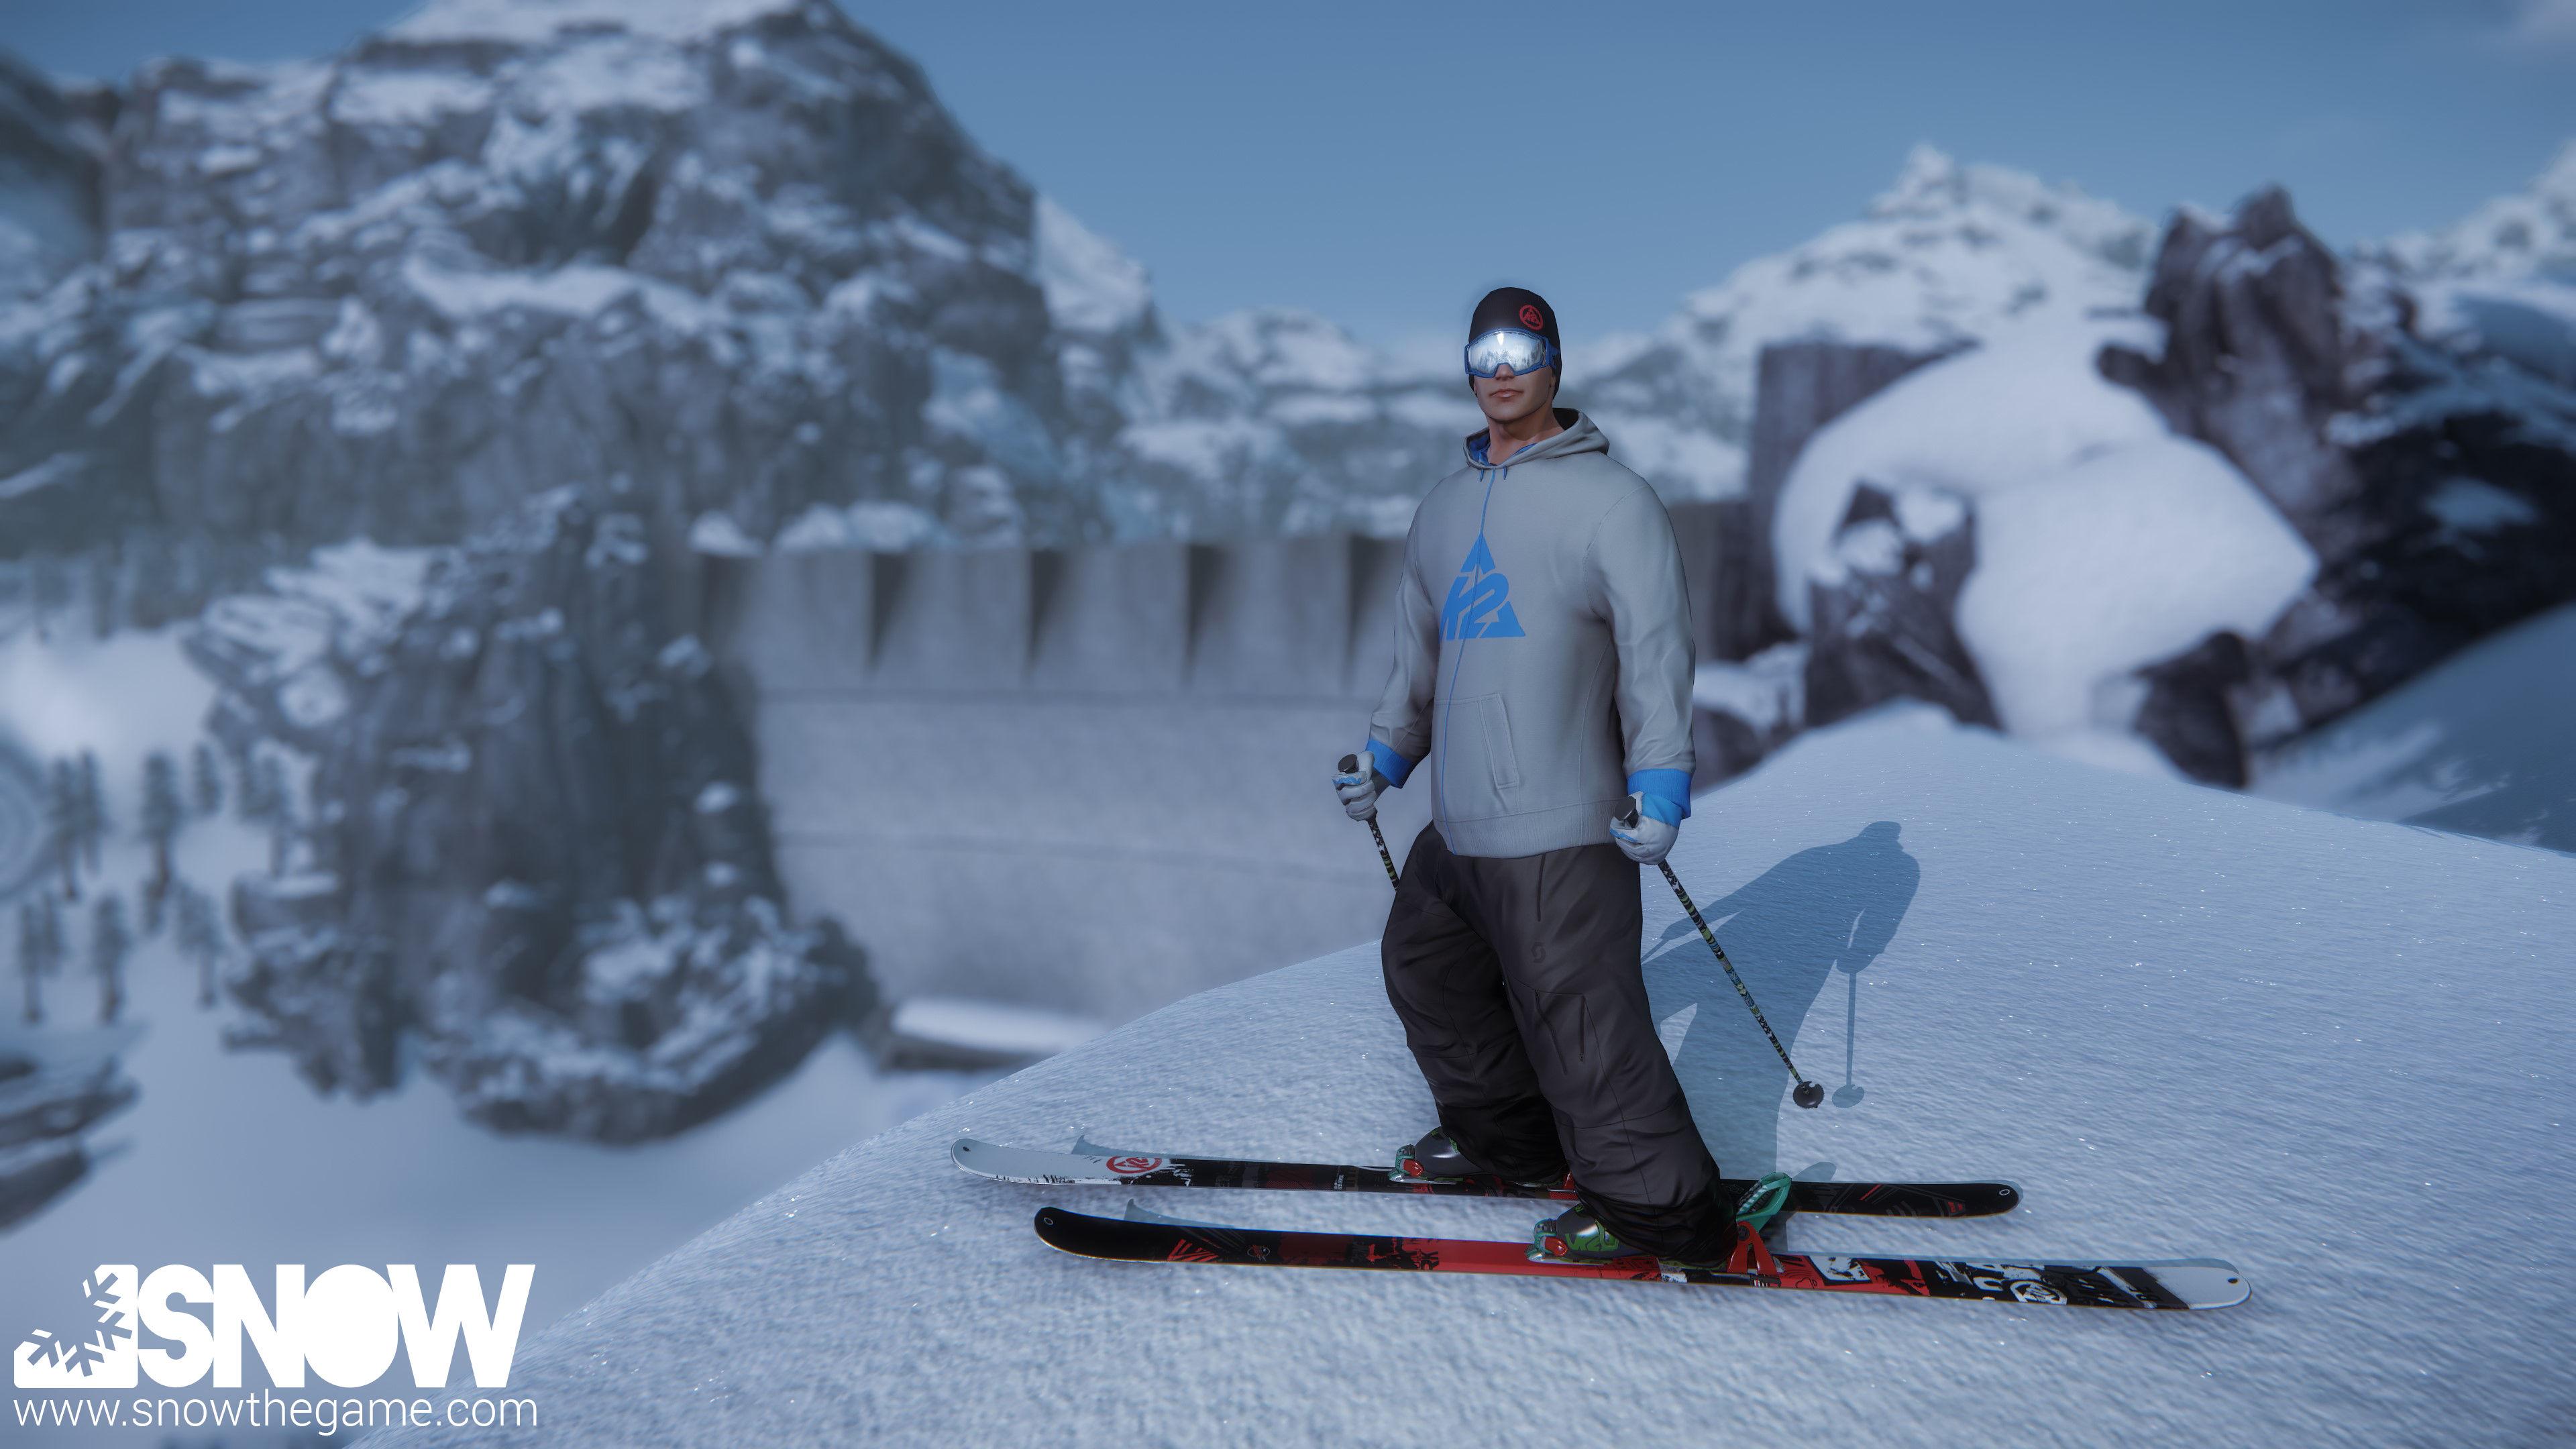 Nové obrázky z adrenalinového SNOW 88124